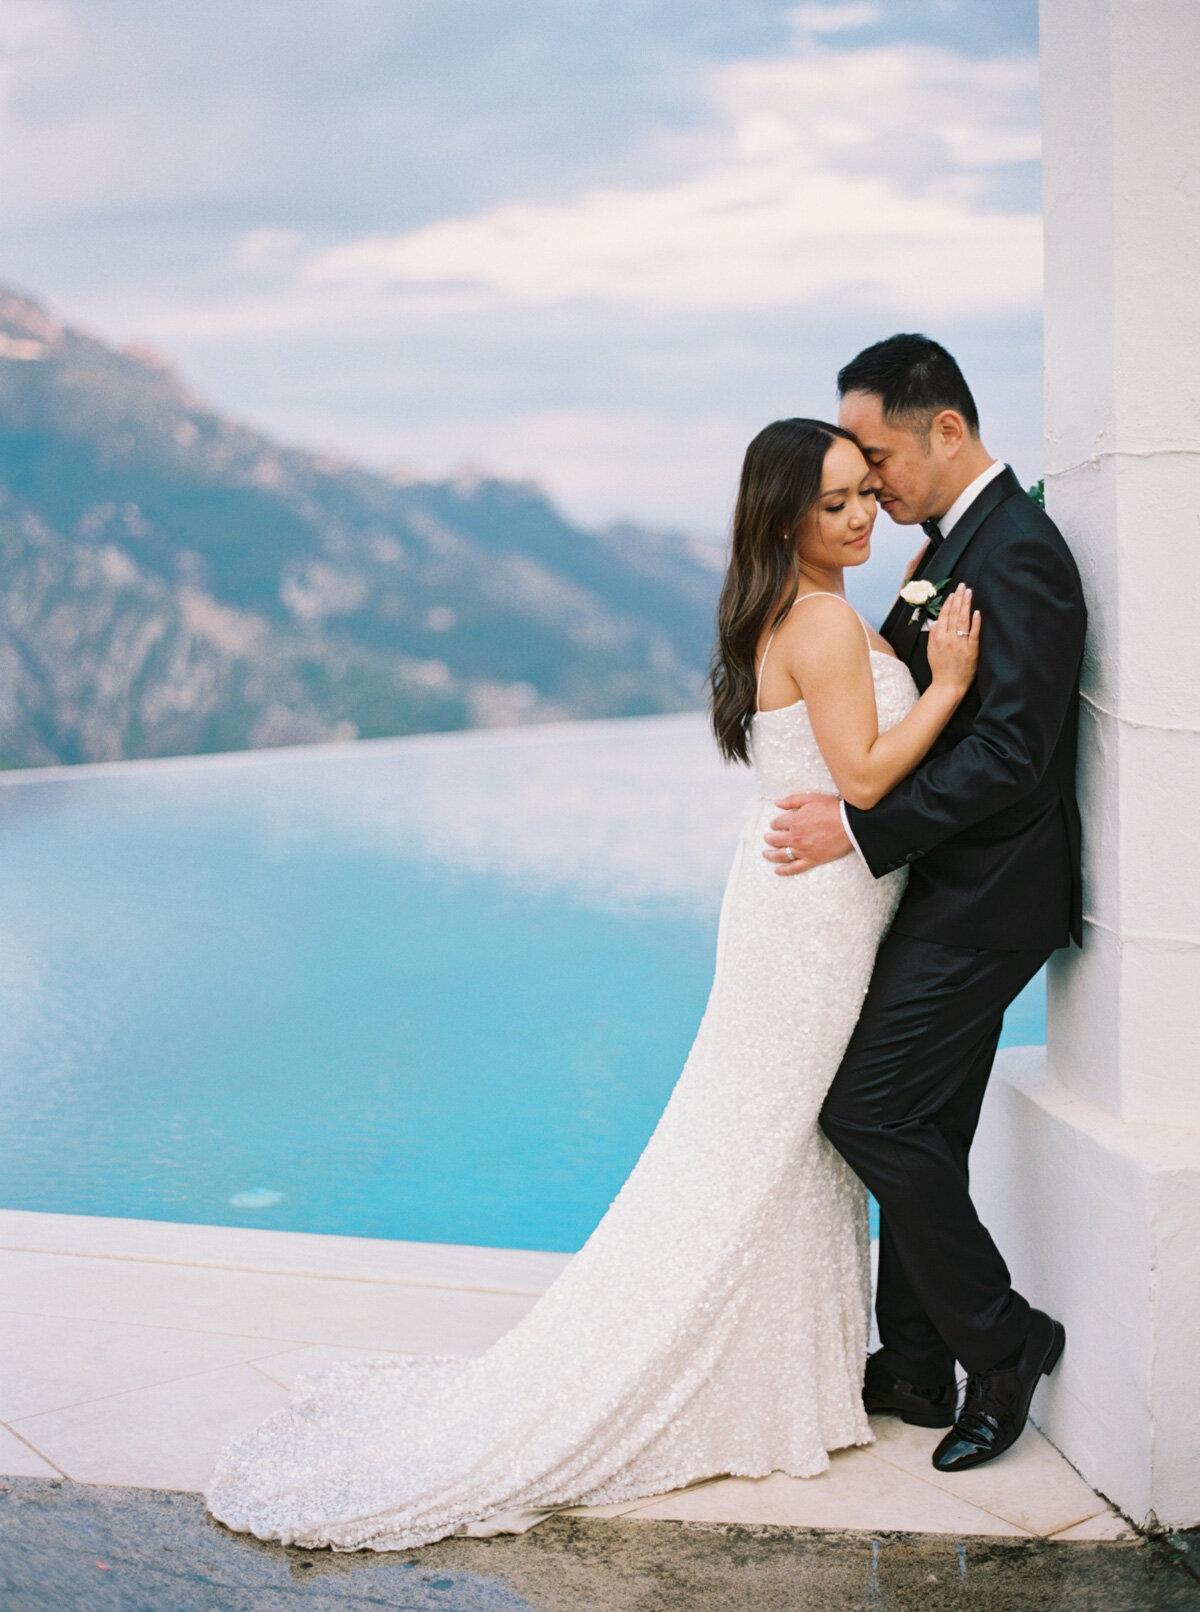 Belmond-Hotel-Caruso-ravello-elopement-Katie-Grant-destination-wedding (42 of 50).jpg